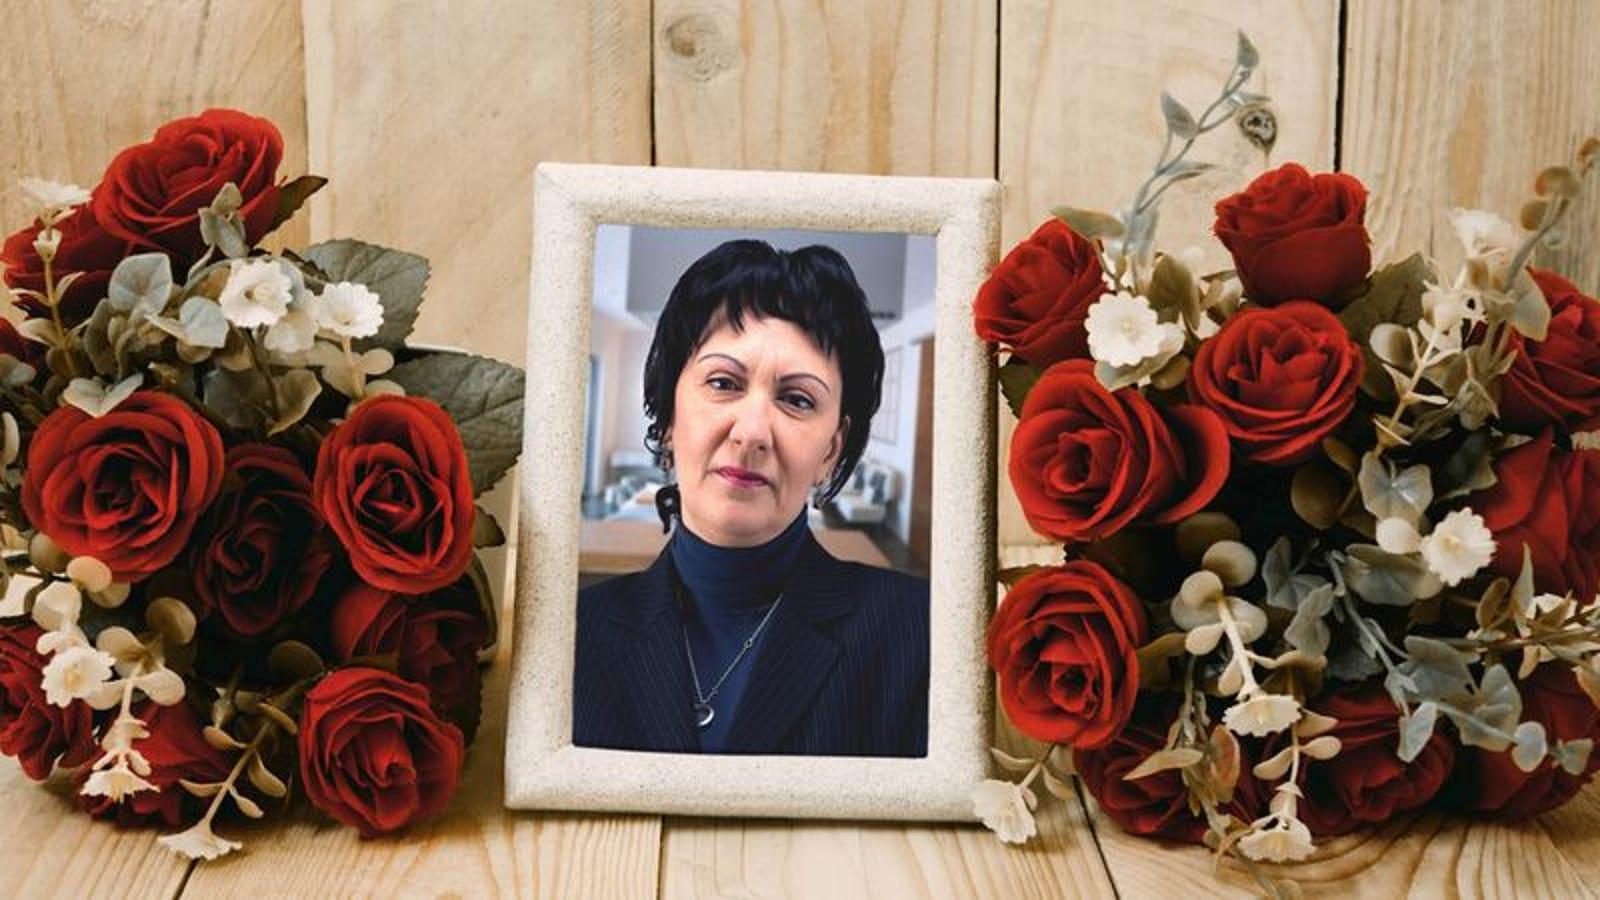 Sudden Death Of Aunt Creates Rupture In Family Gossip Pipeline